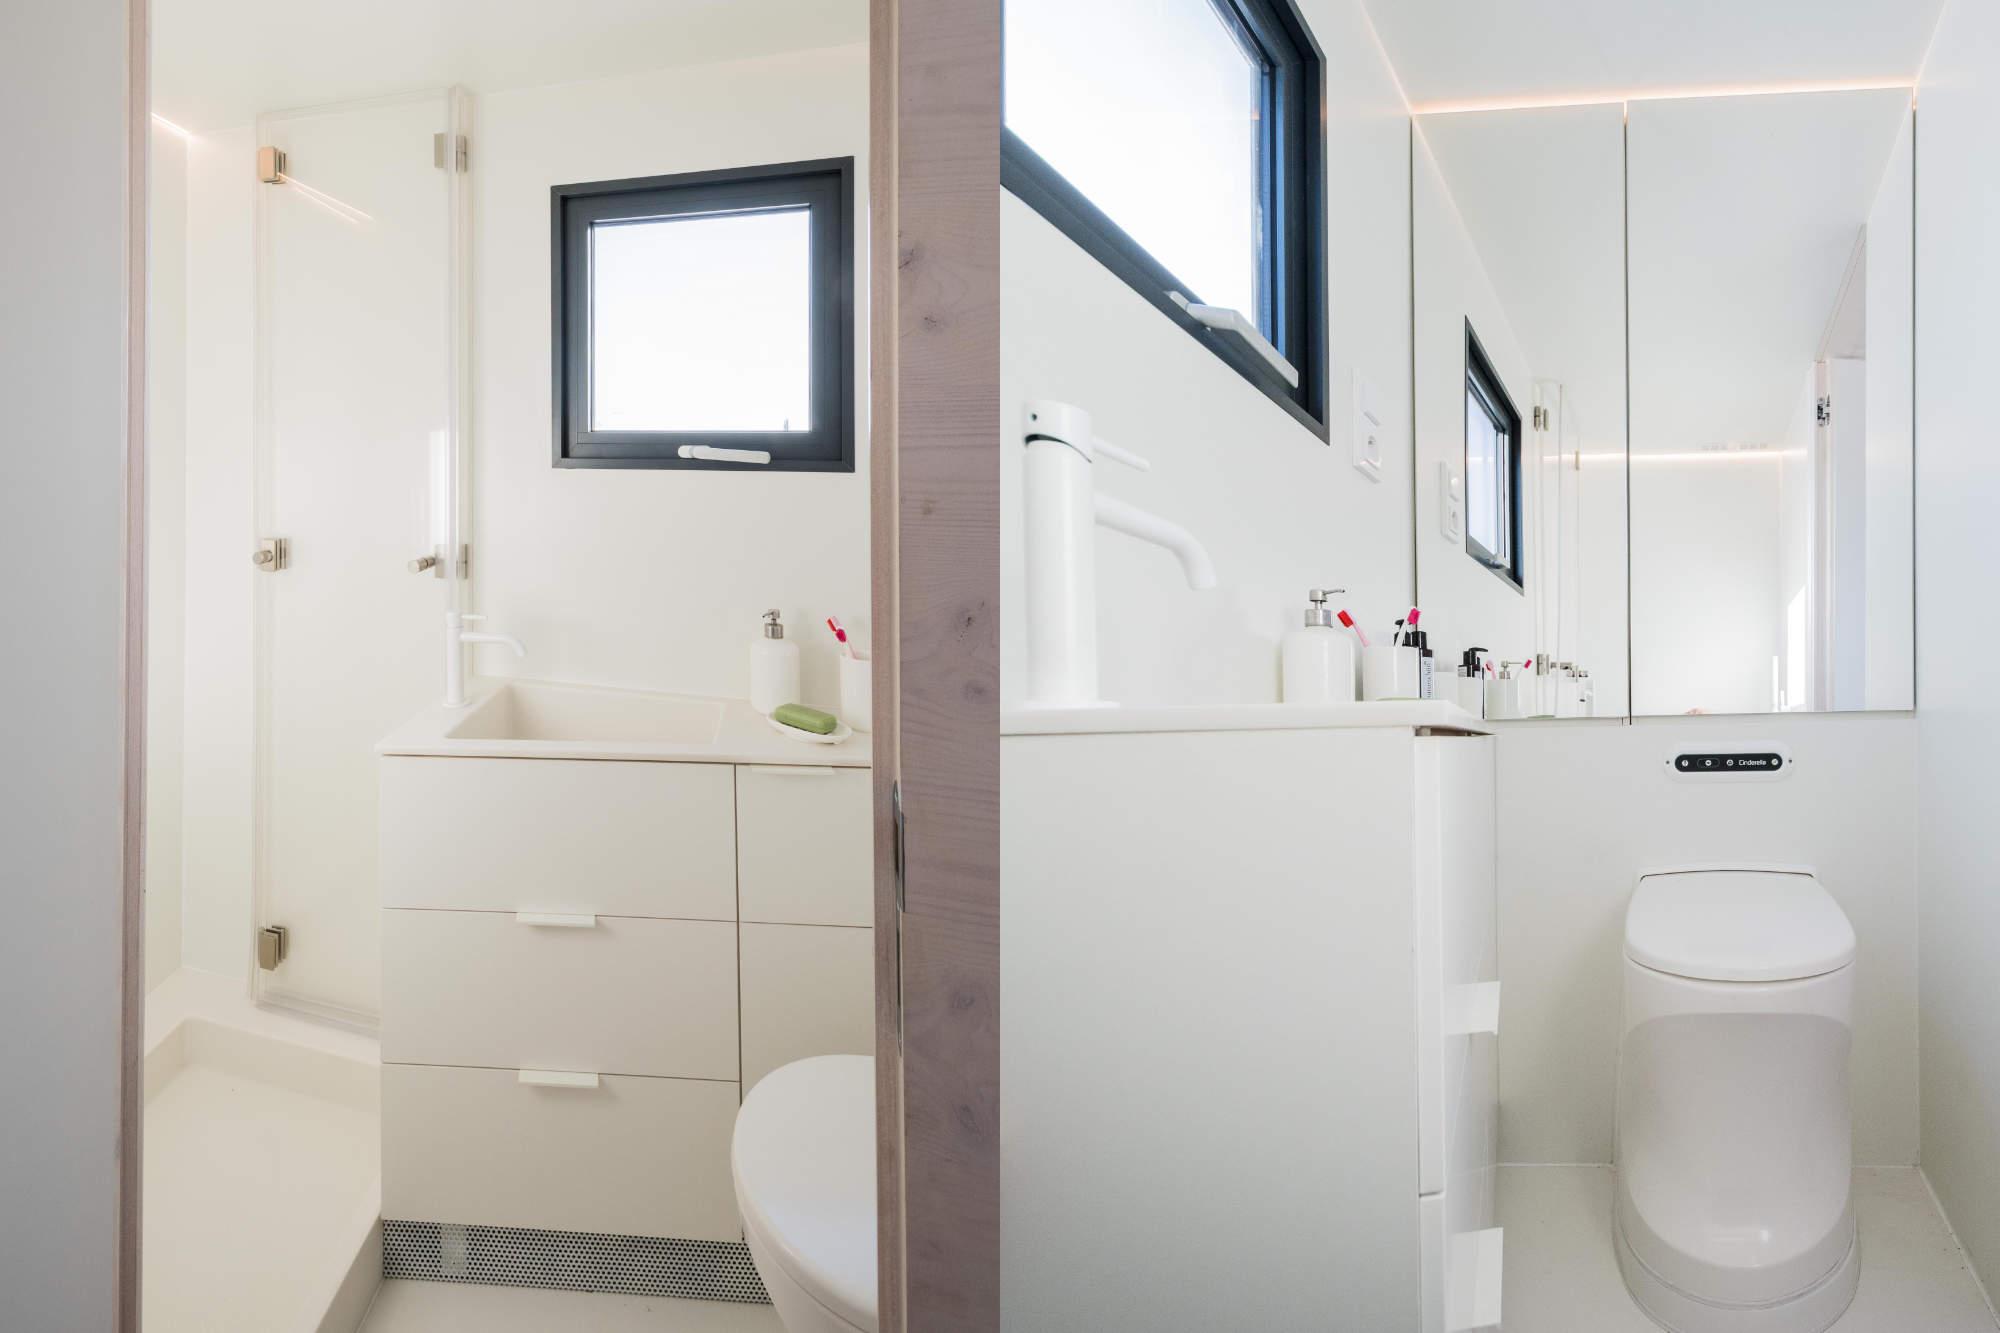 Mobile Hut koupelna